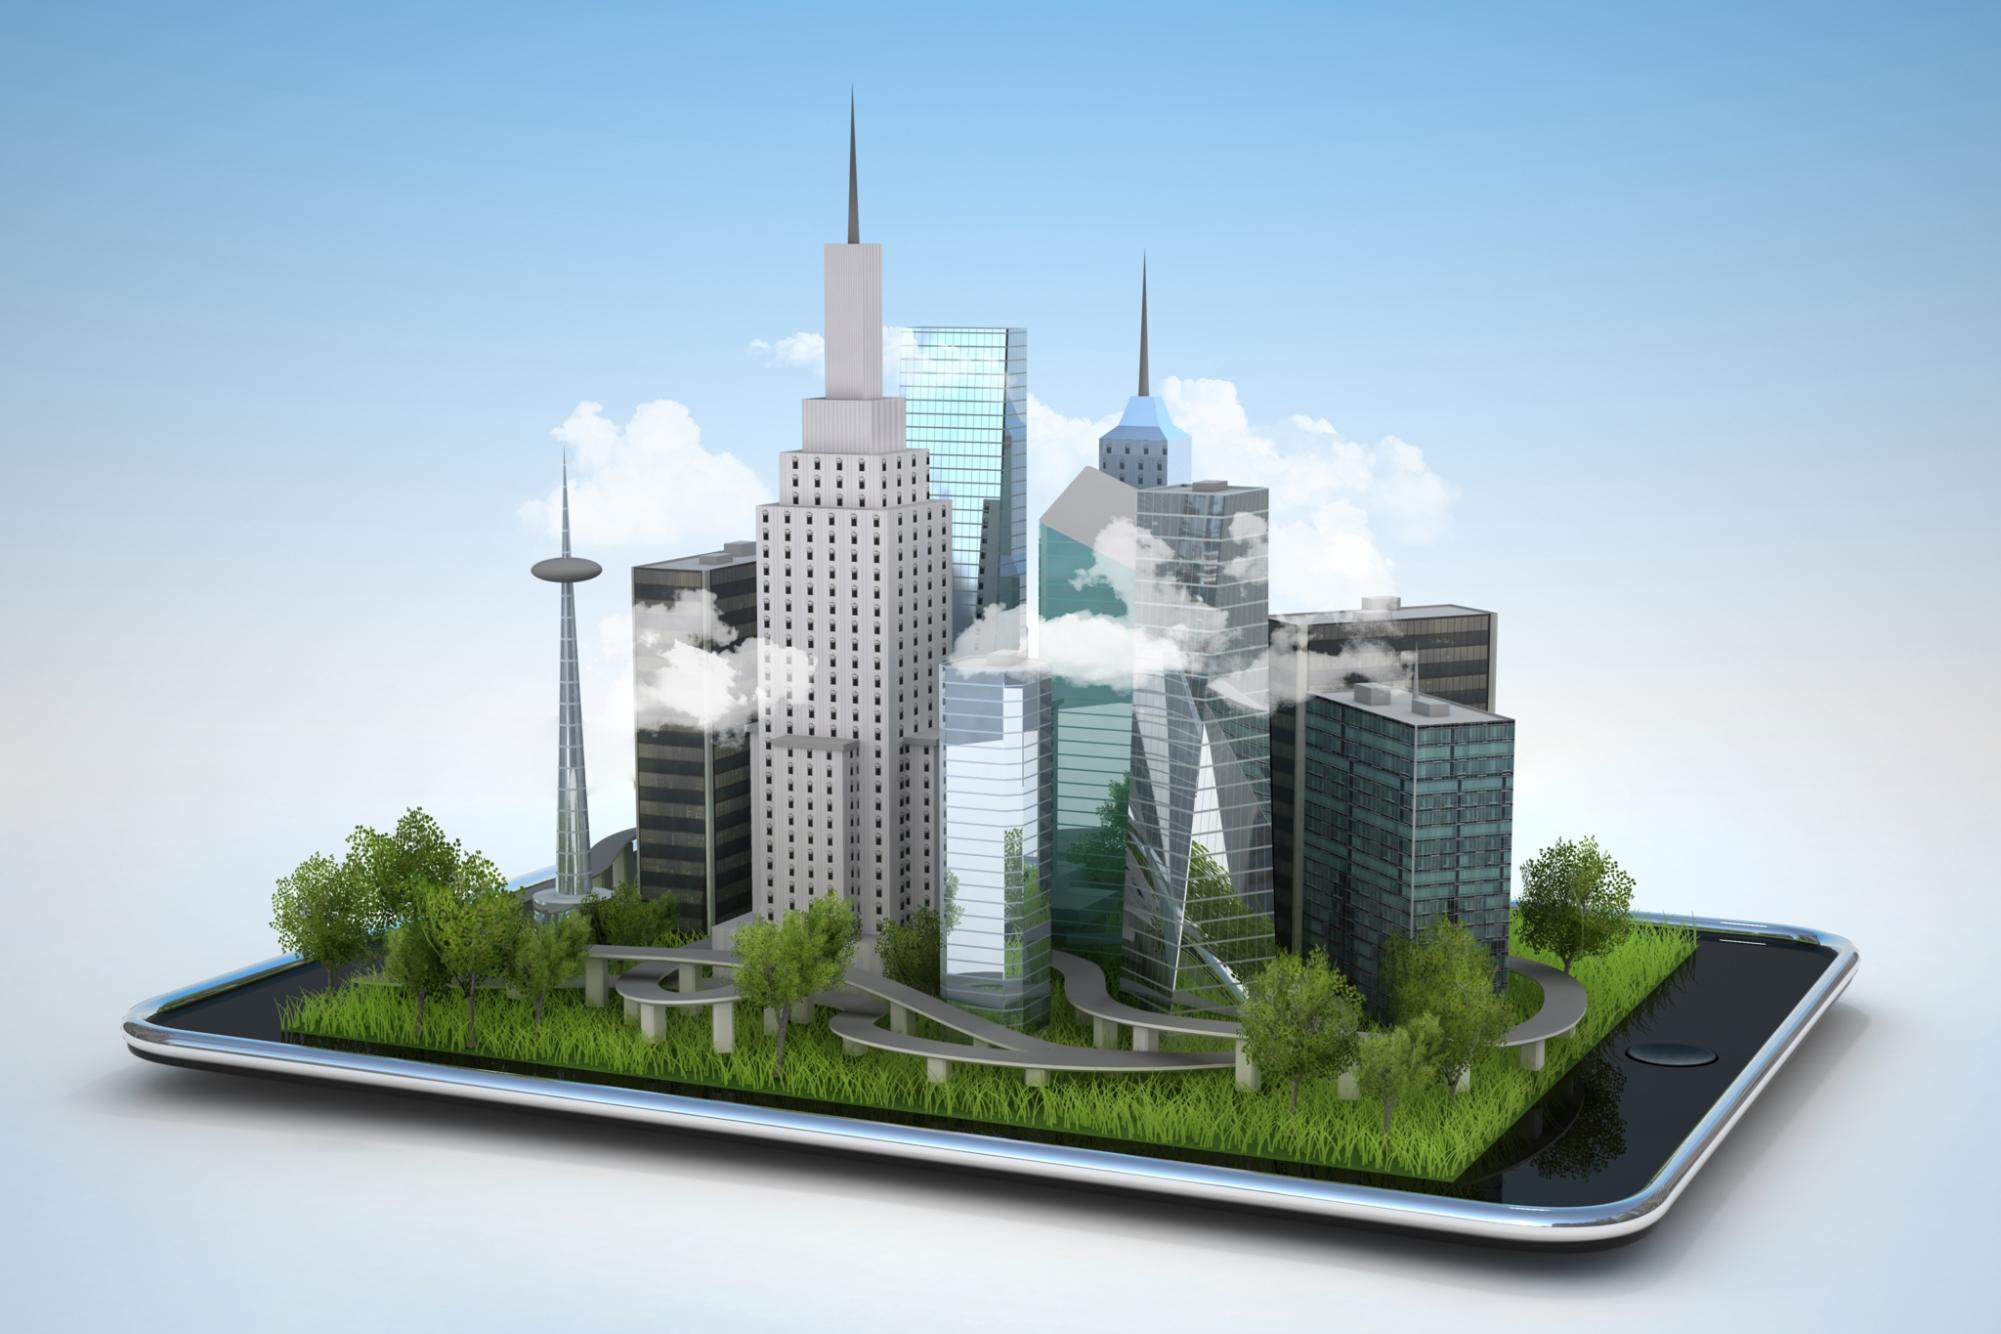 ePole and smart cities